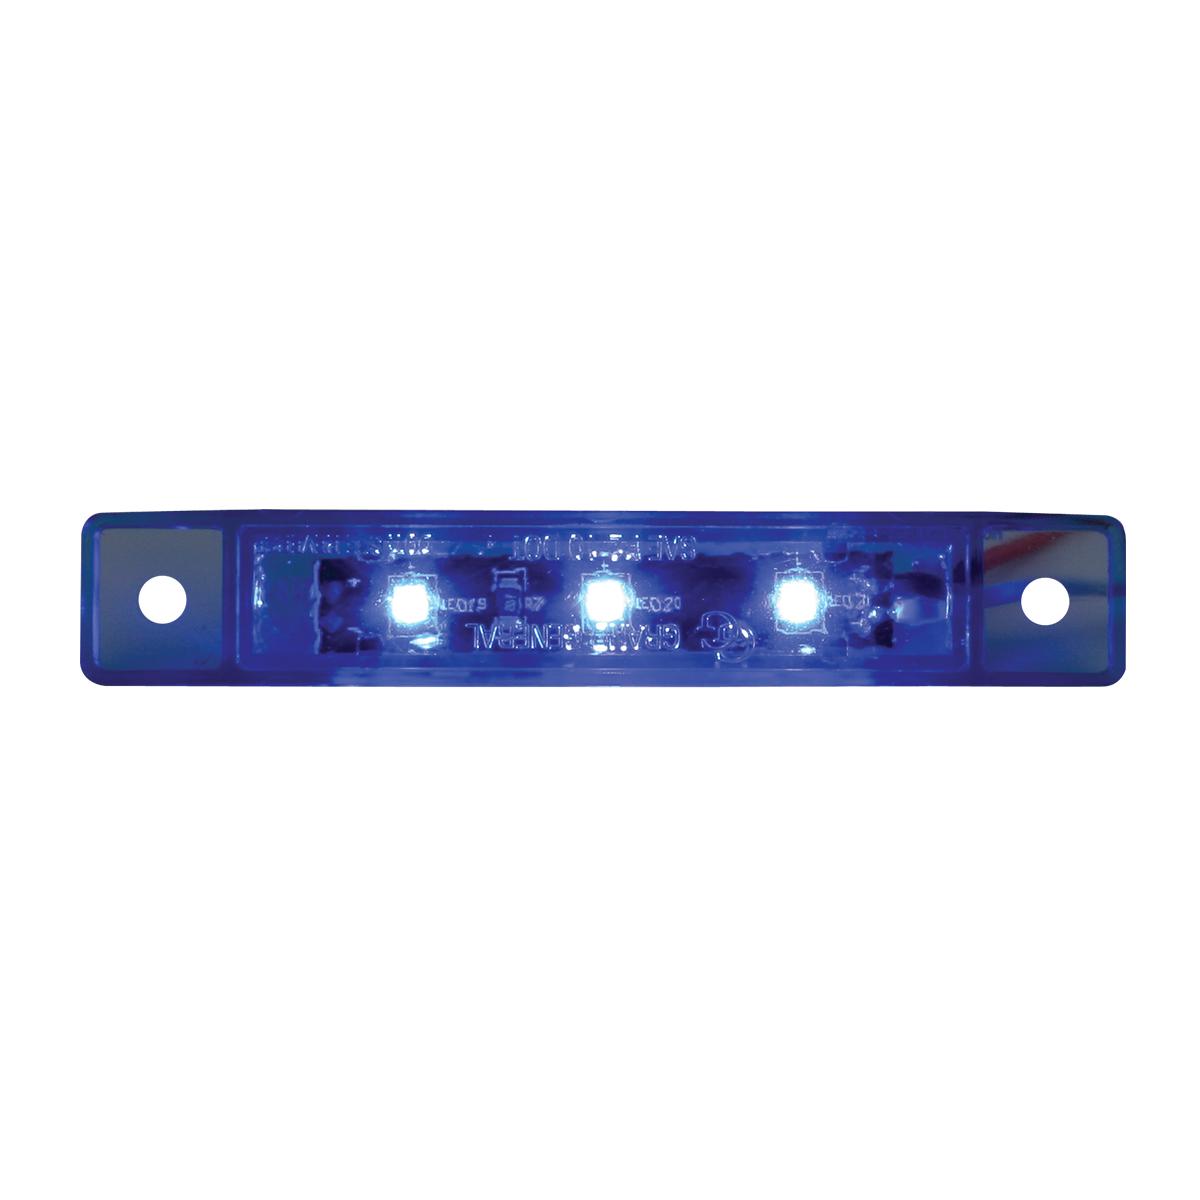 "76285 3.5"" Ultra Thin LED Marker Light"